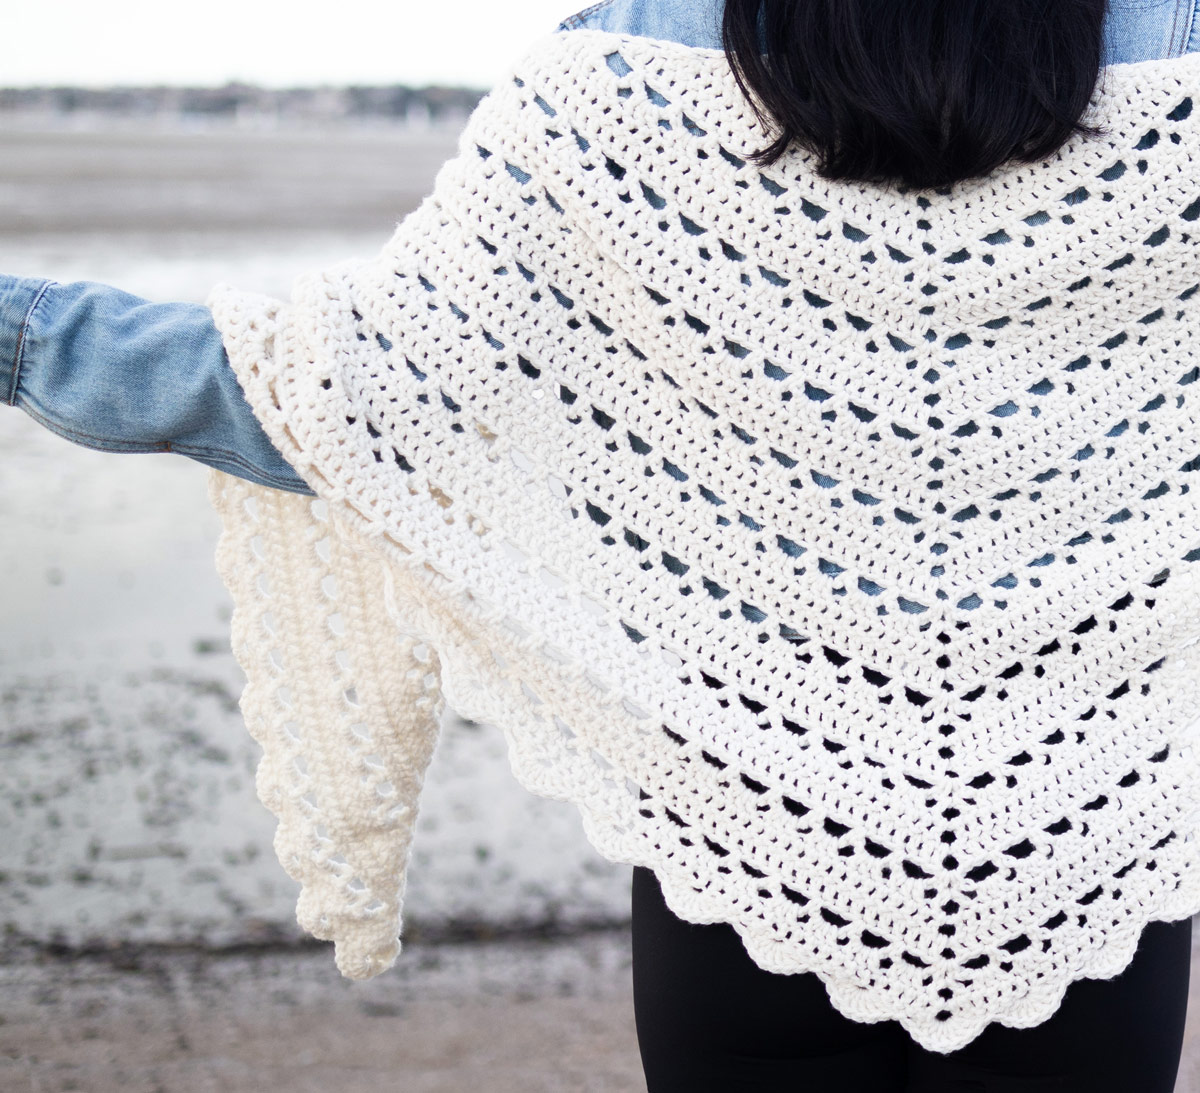 beginner-crochet-wrap-free-pattern-video-tutorial-1